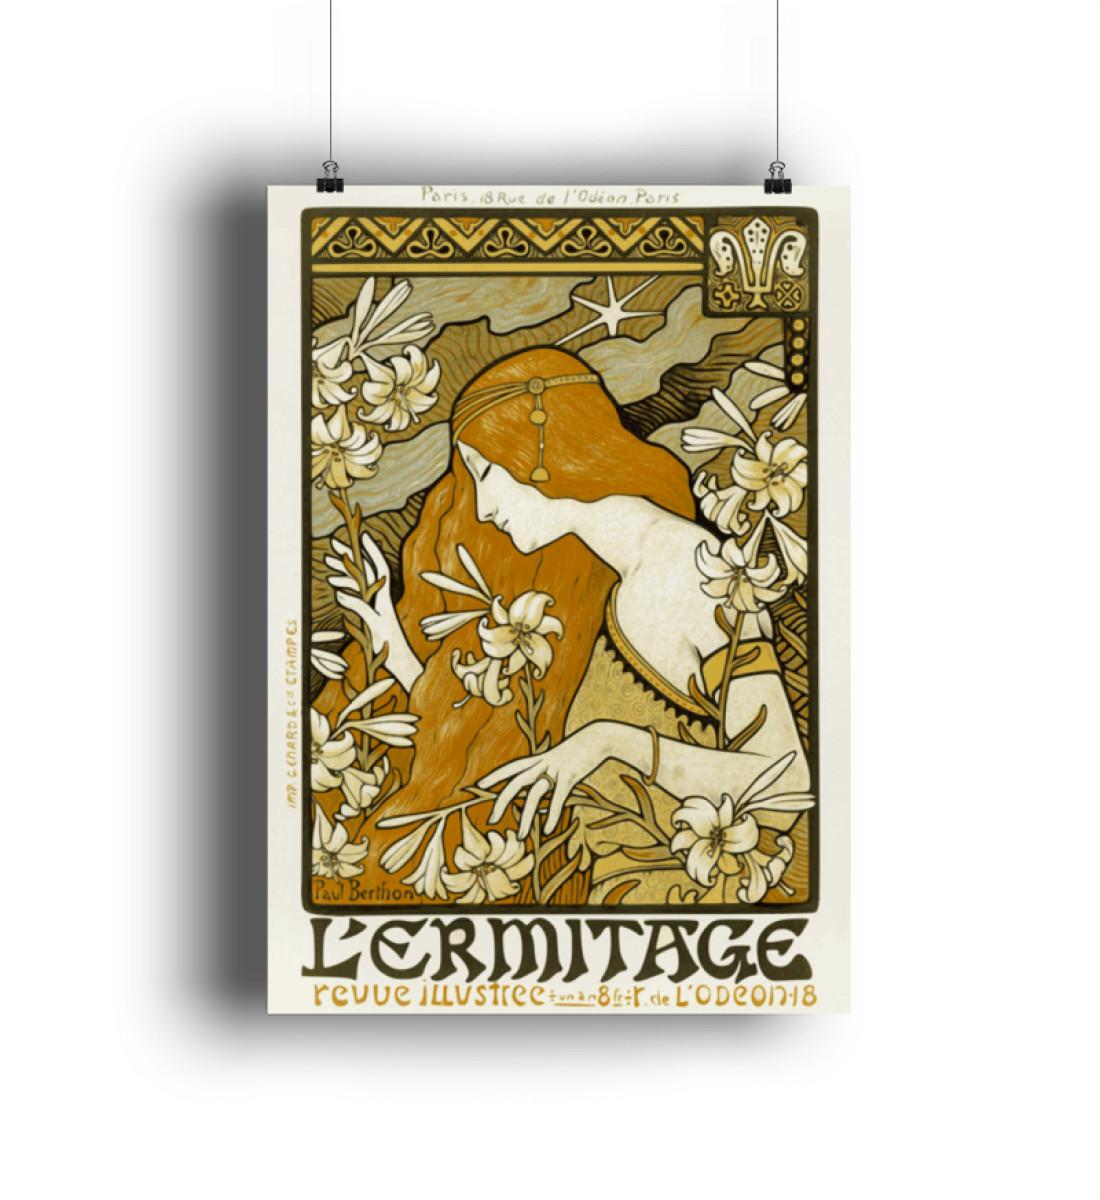 L-ermitage - Paul Berthon - DIN A1 Poster (hochformat)-3